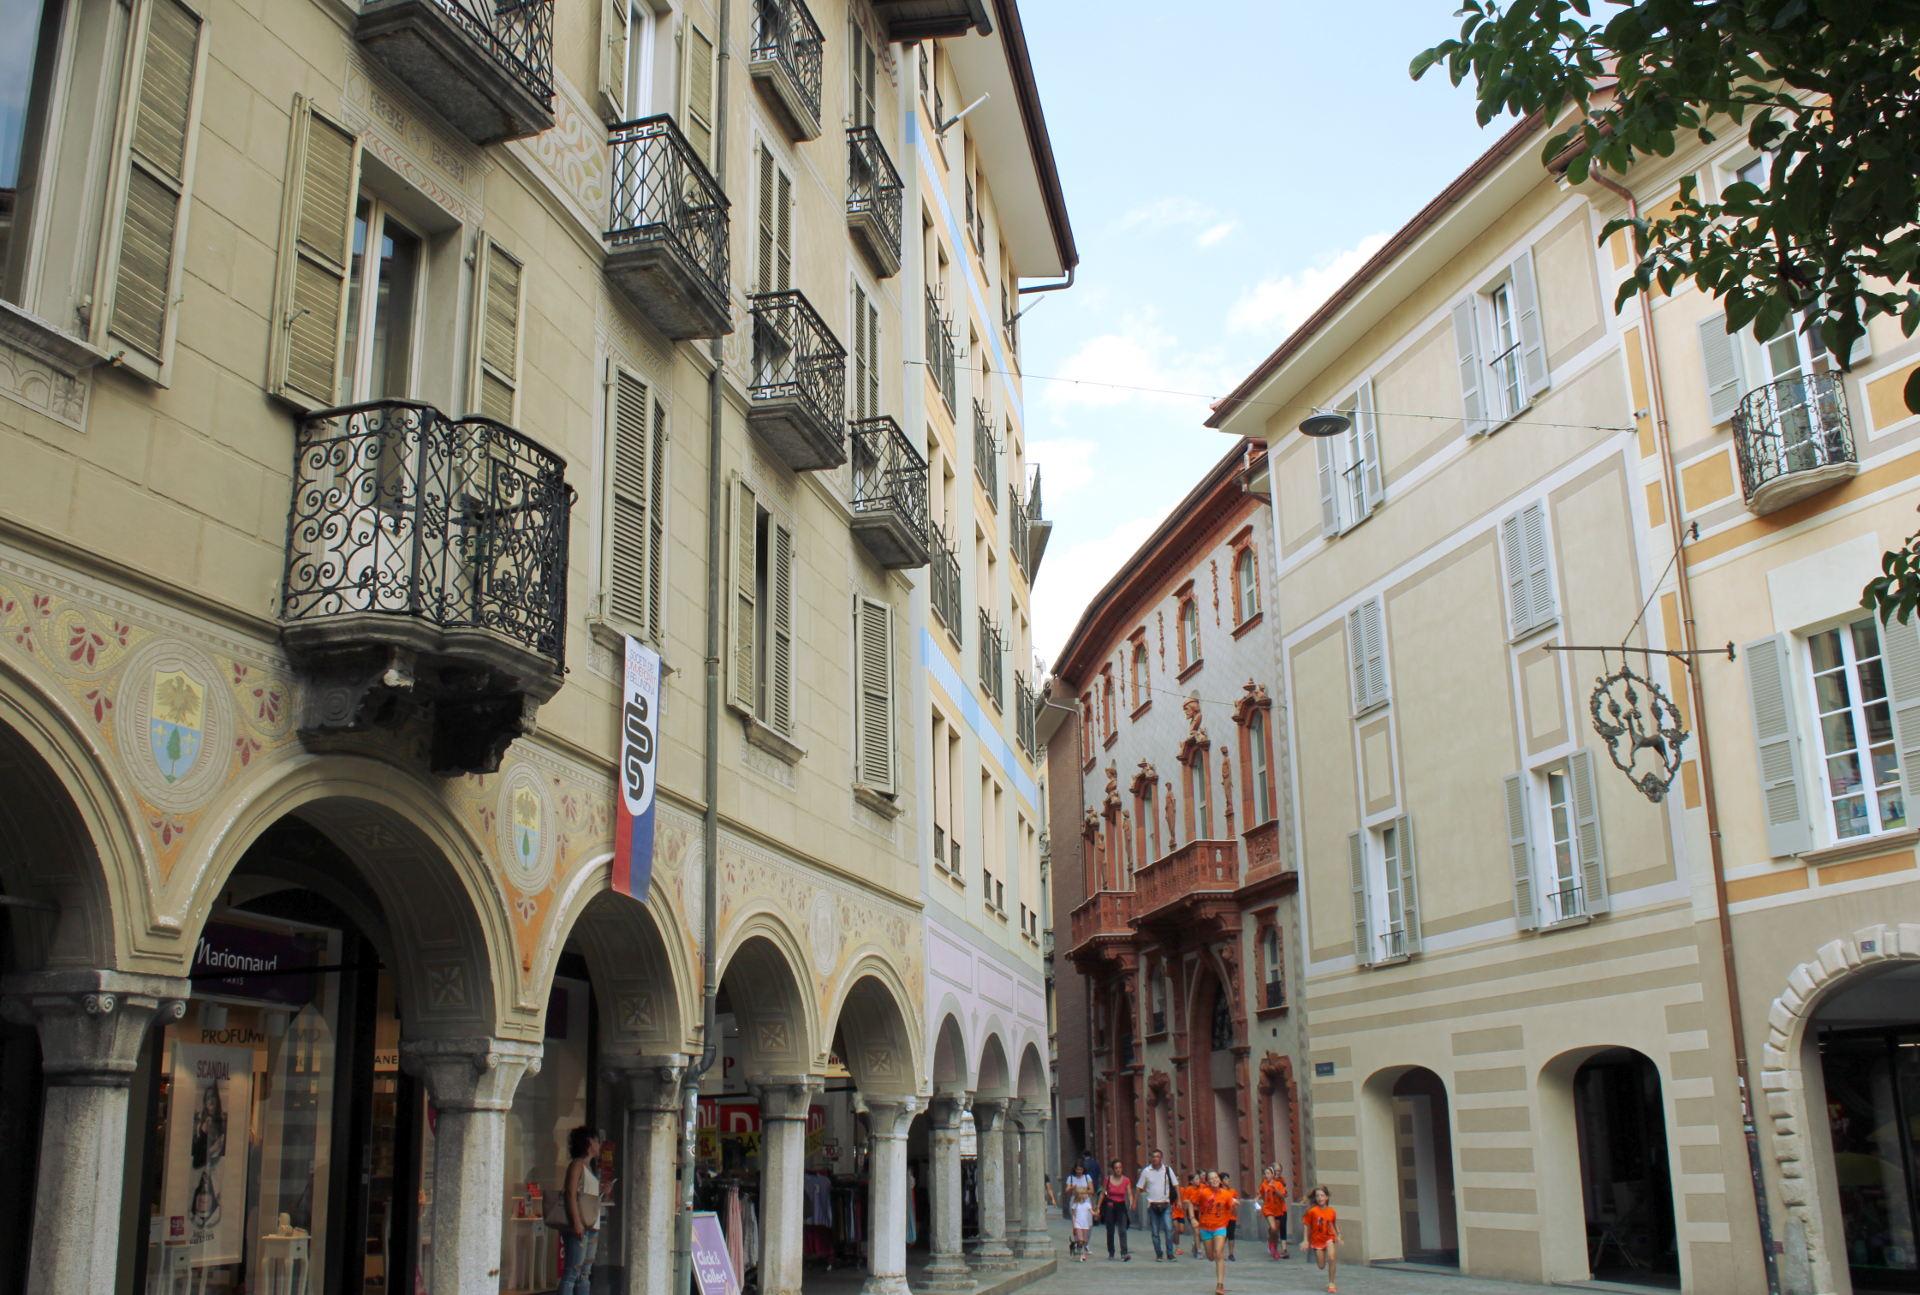 ulice miasta: Bellinzona iglawpodrozy